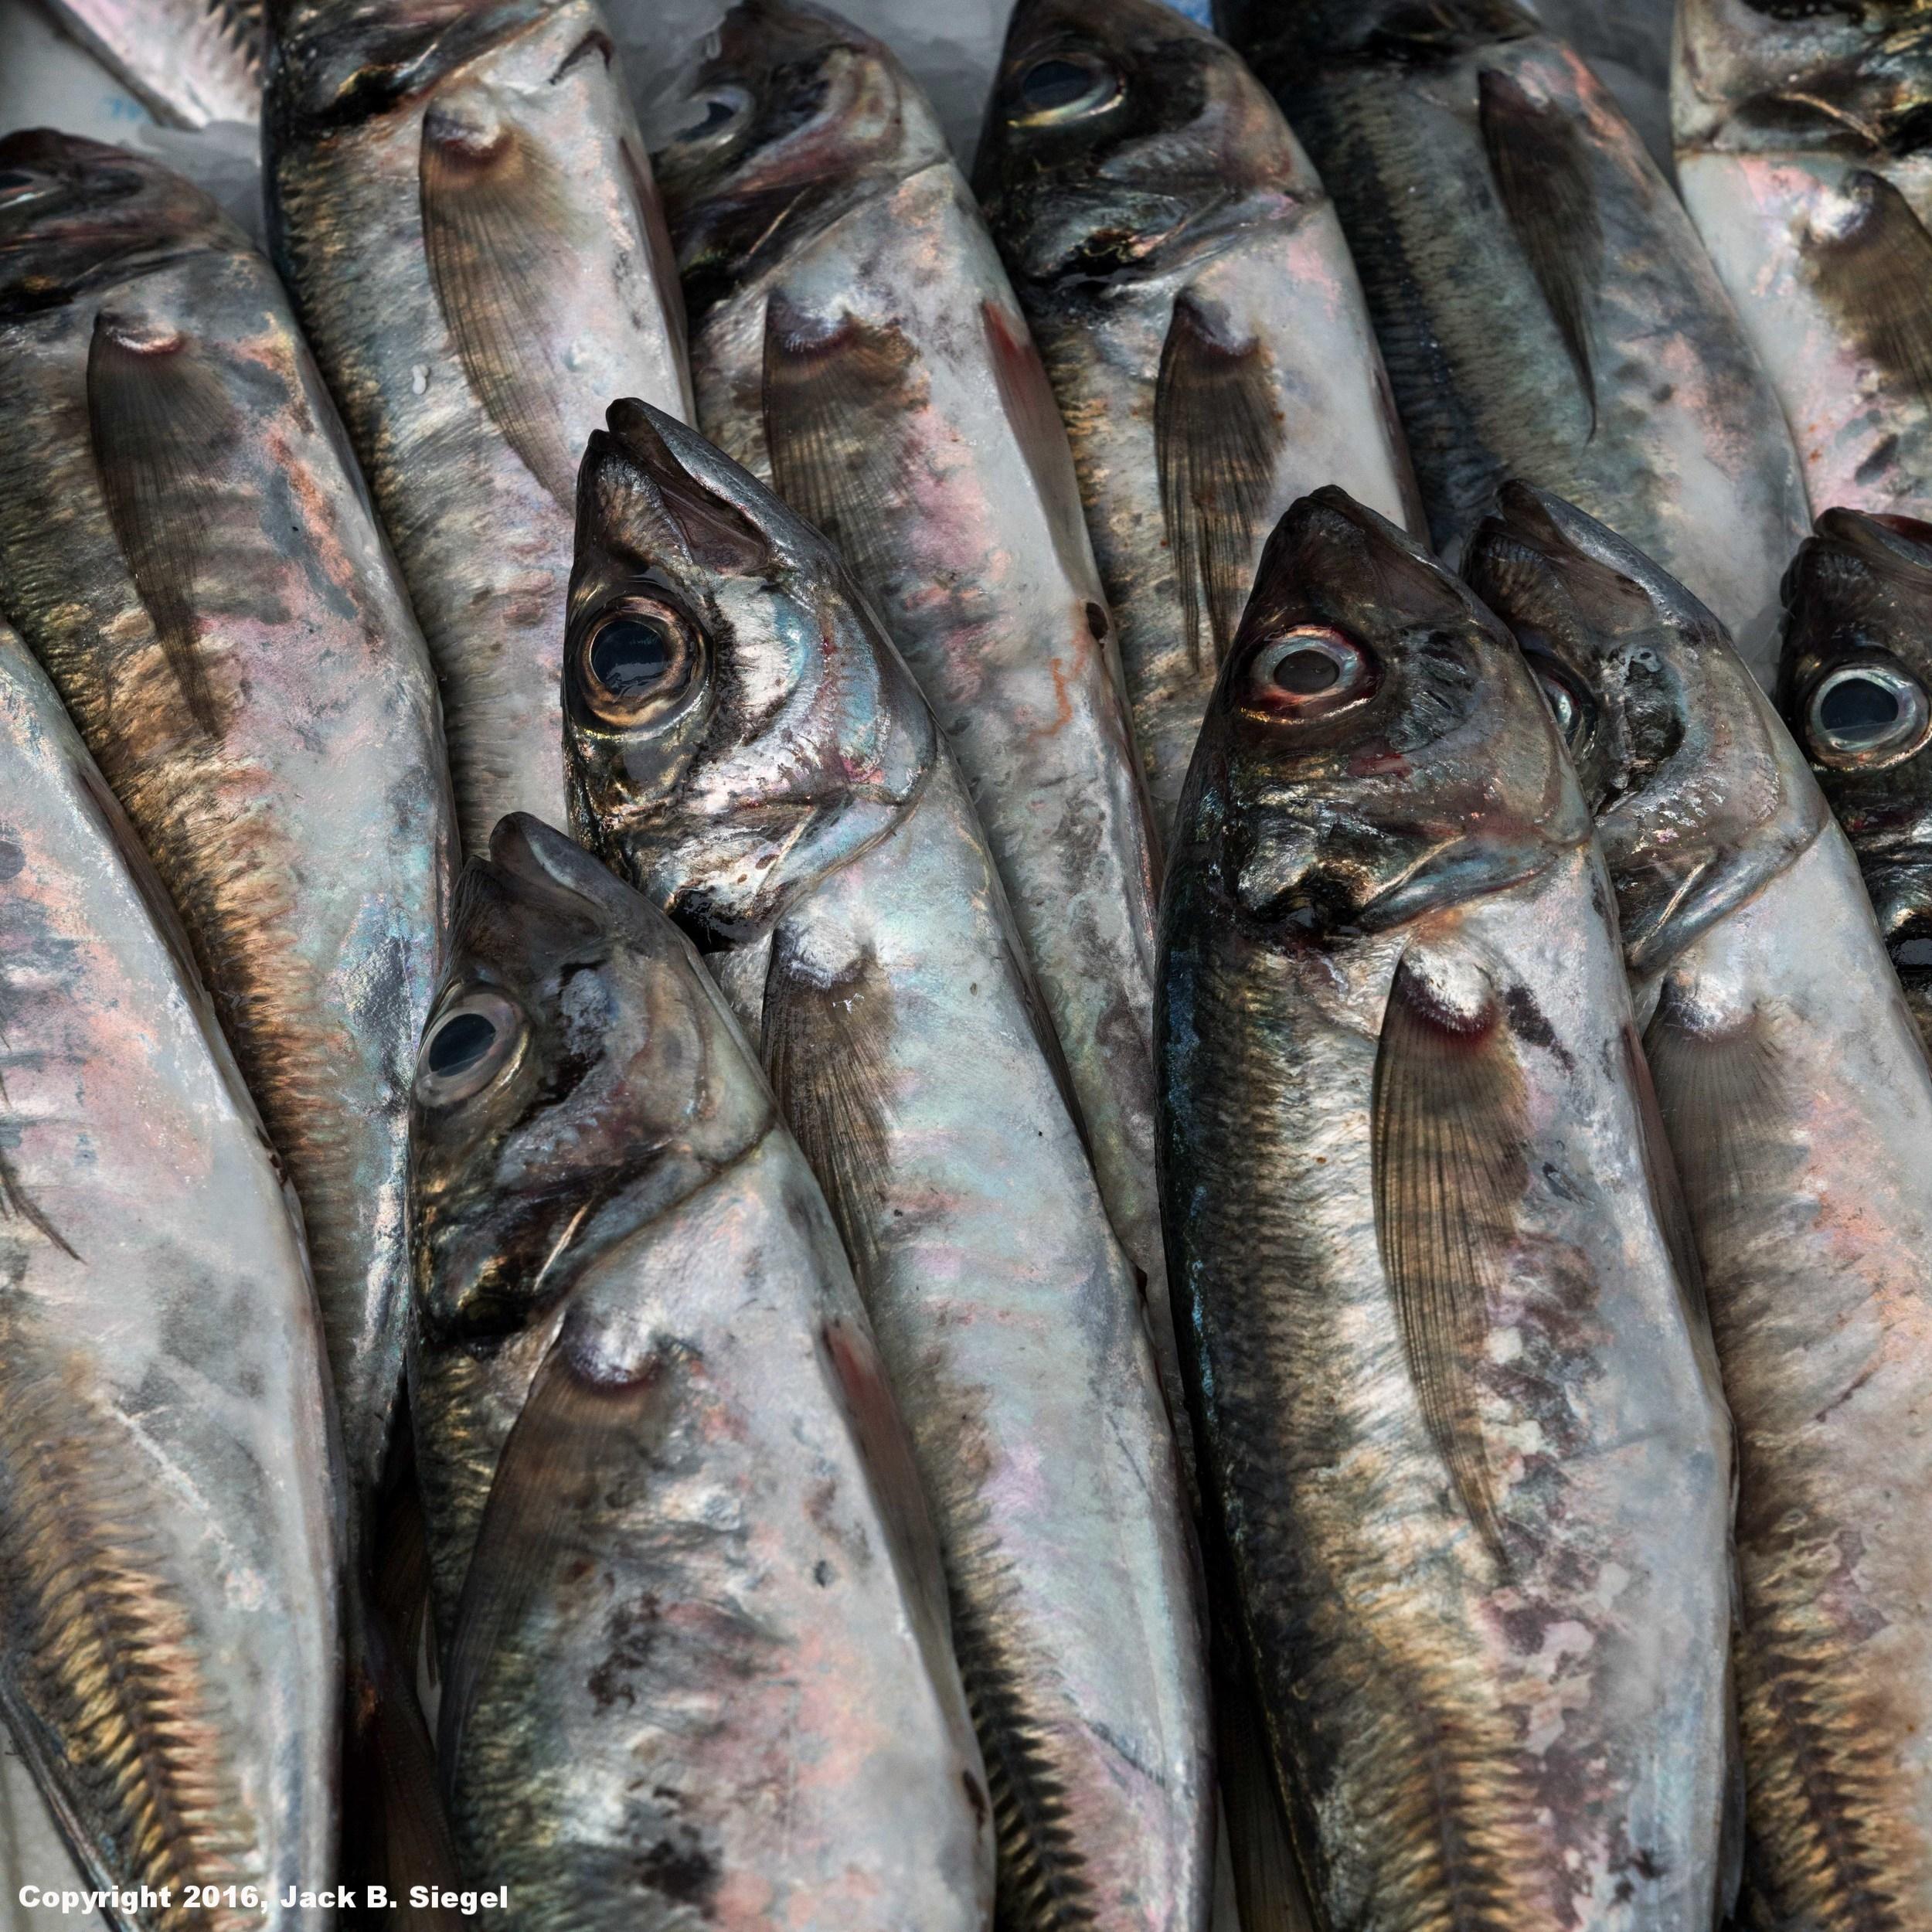 DSC03966_sRGB_CO_Relative_Fresh Fish in the Market.jpg